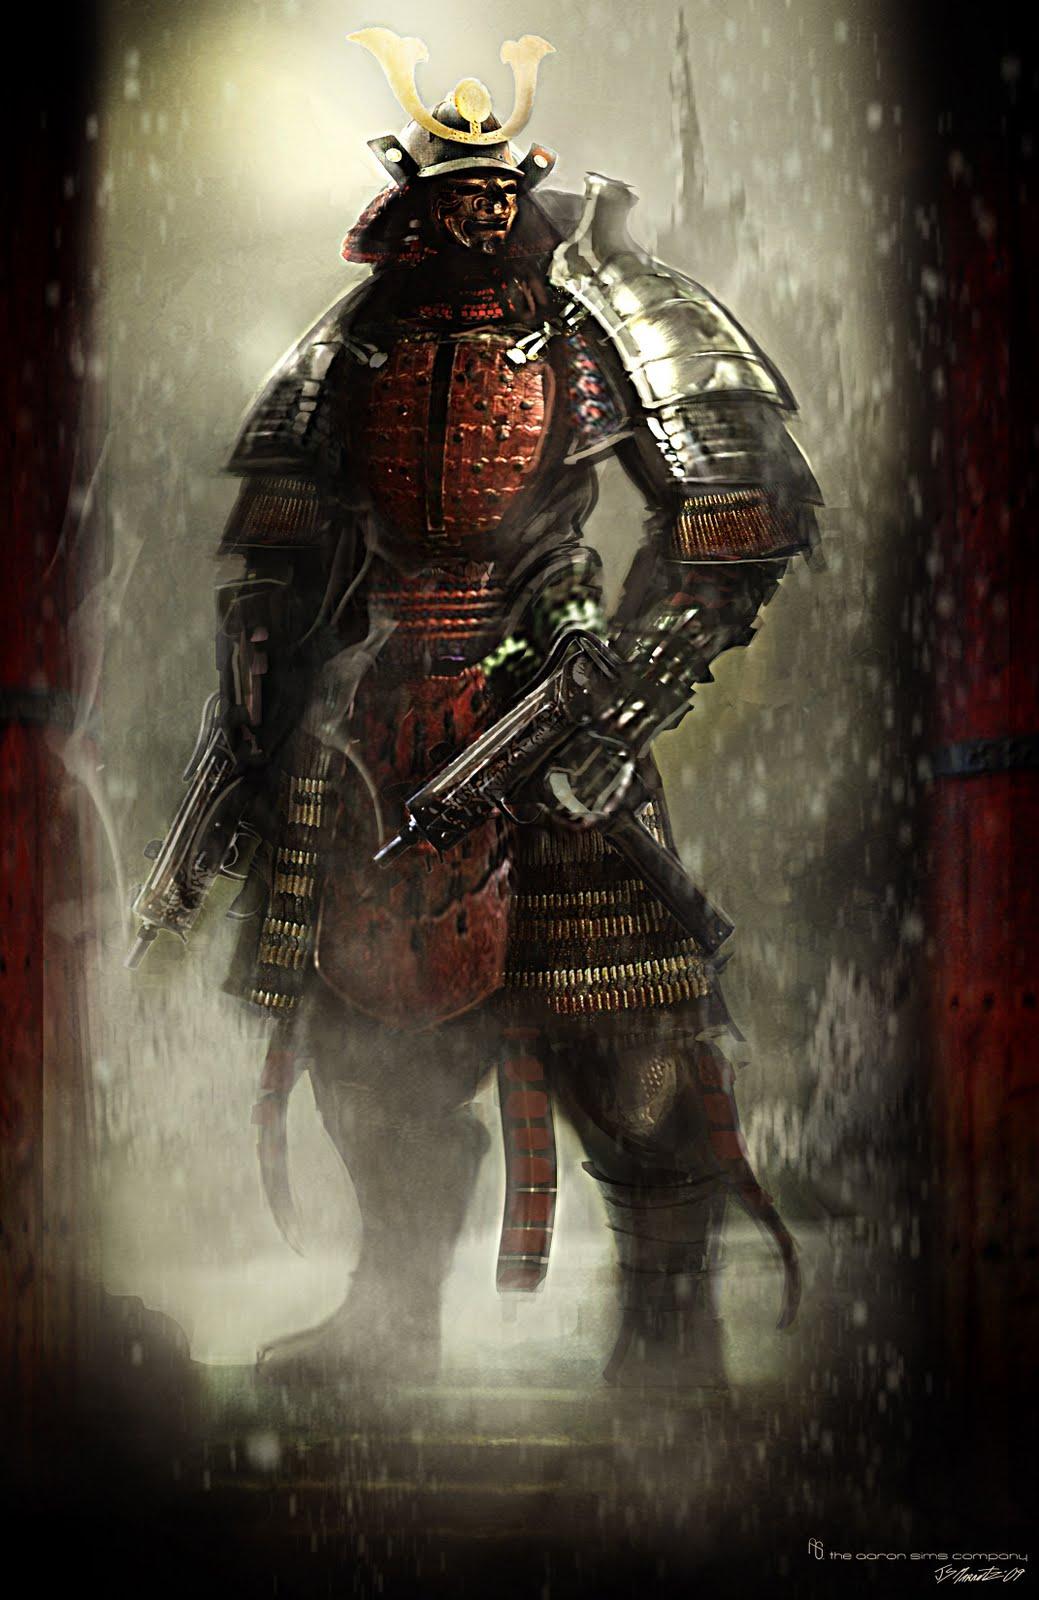 Samurai warriors sucker punch wallpaper 6891 - Ninja Or Samurai